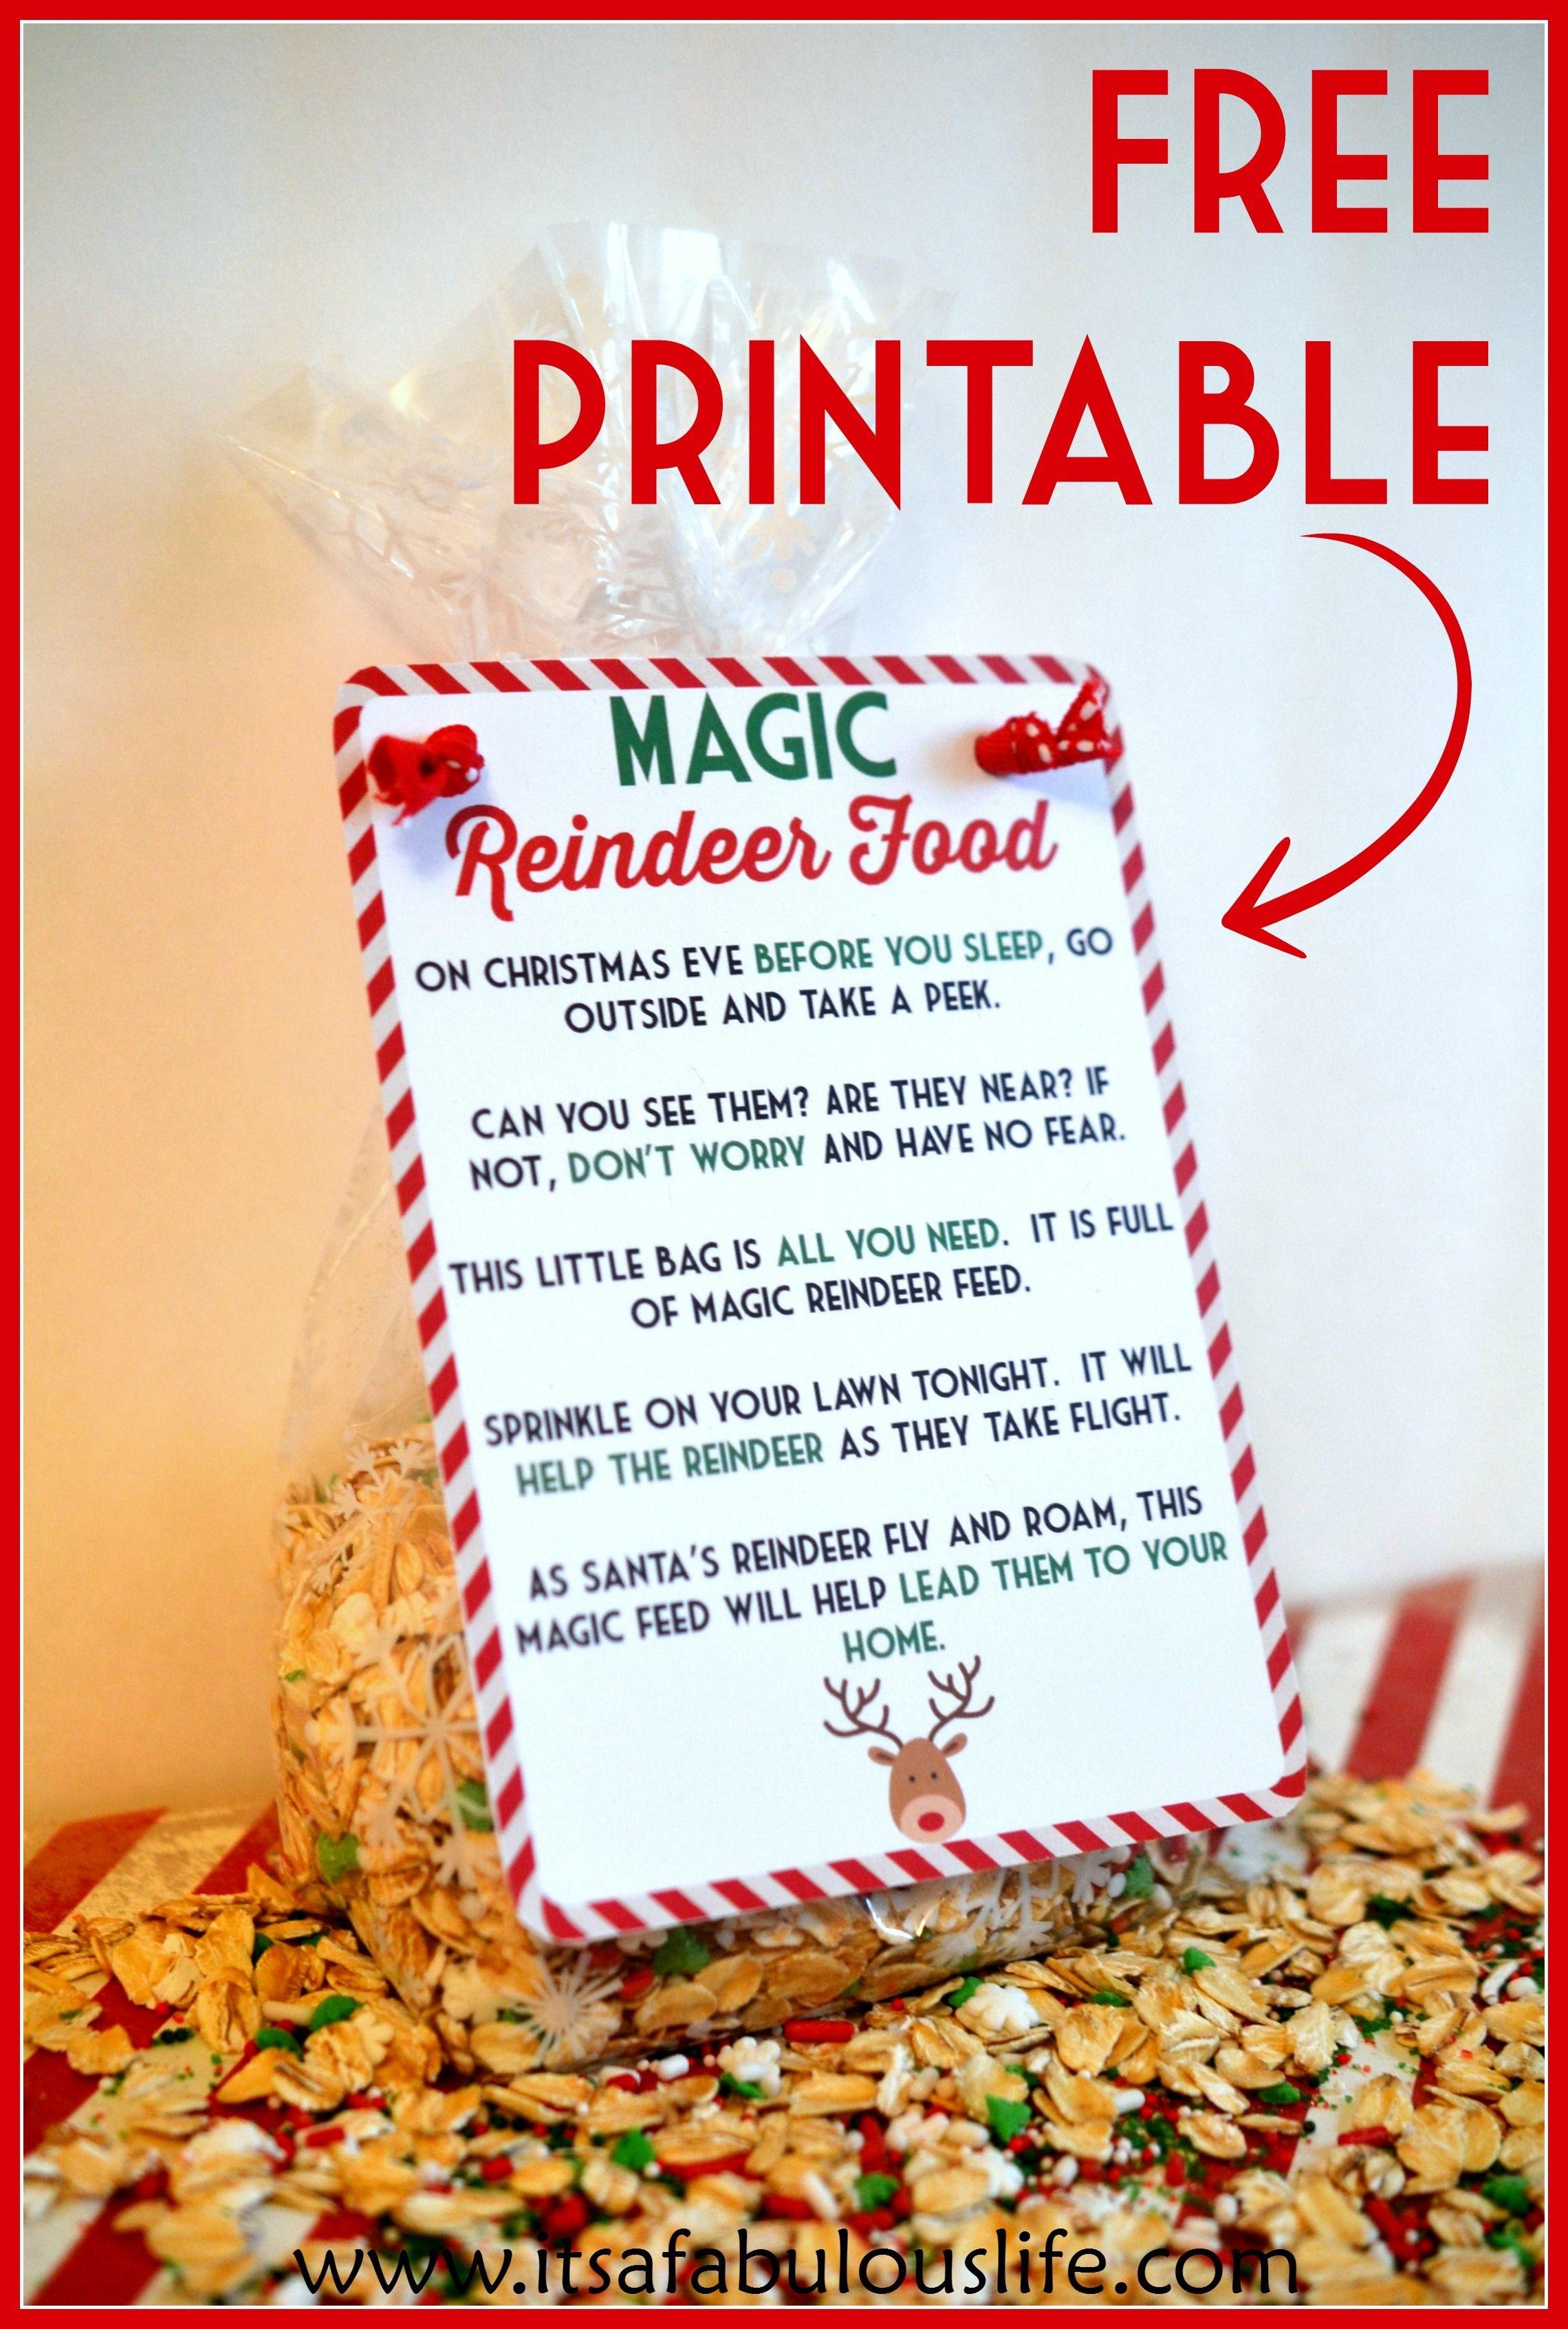 Magic Reindeer Food Poem & Free Printable | Little People, Big - Free Printable Reindeer Dust Poem